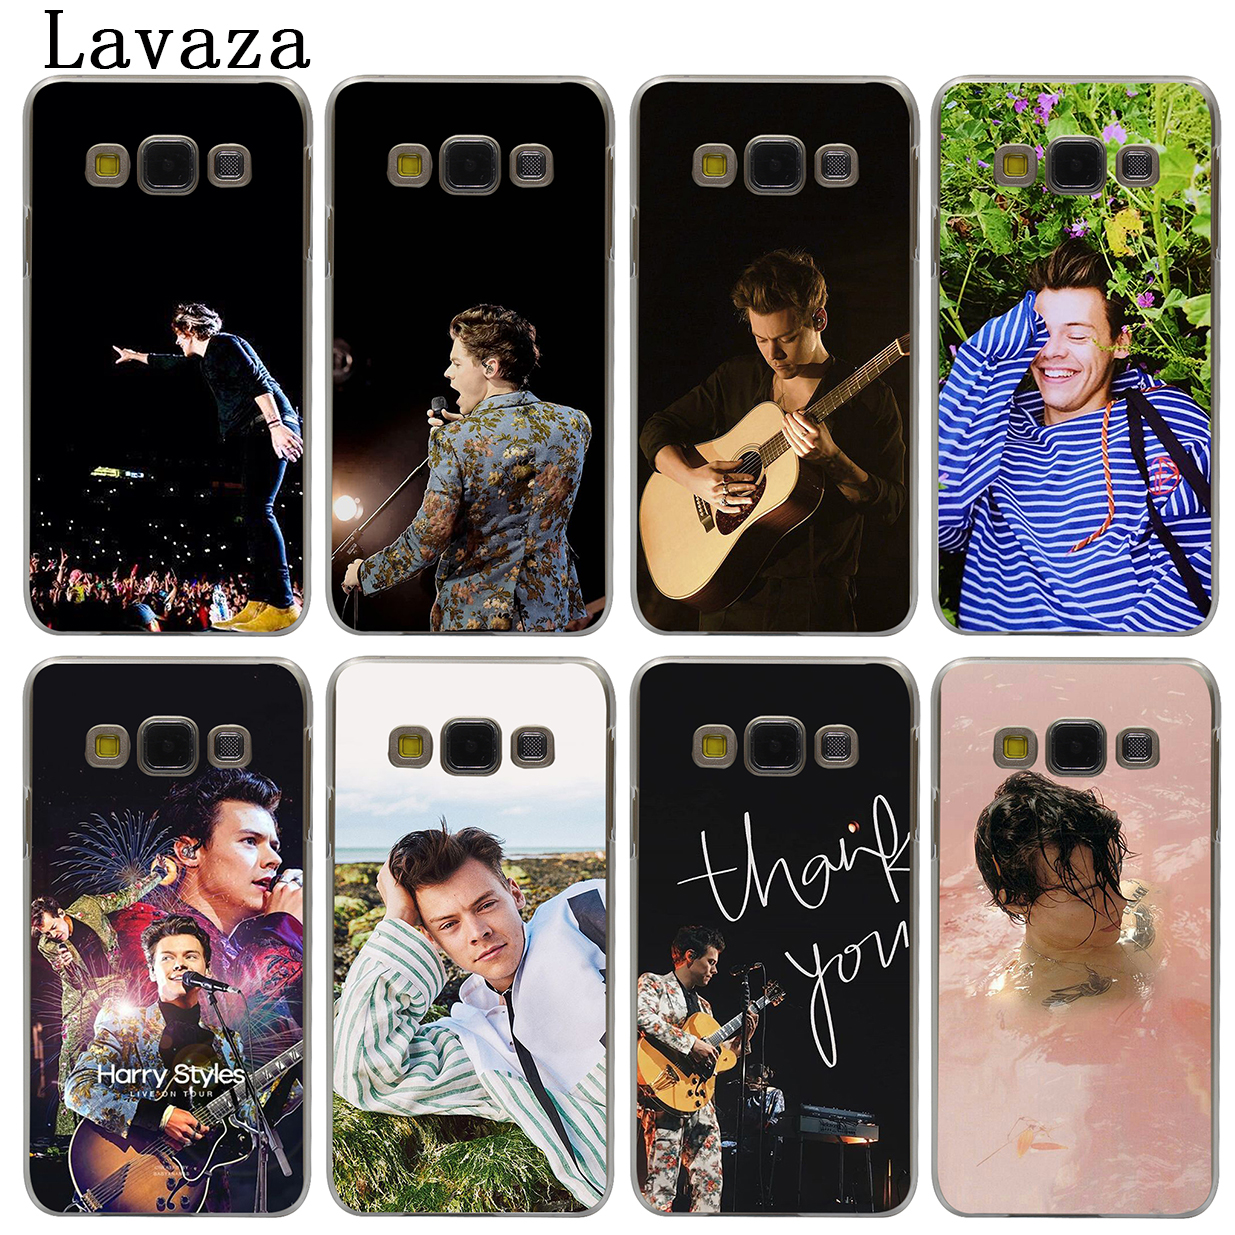 Lavaza Harry Styles Hard Cover Case for Samsung Galaxy J7 J1 J2 J3 J5 2015 2016 2017 Prime Pro Ace 2018 Cases